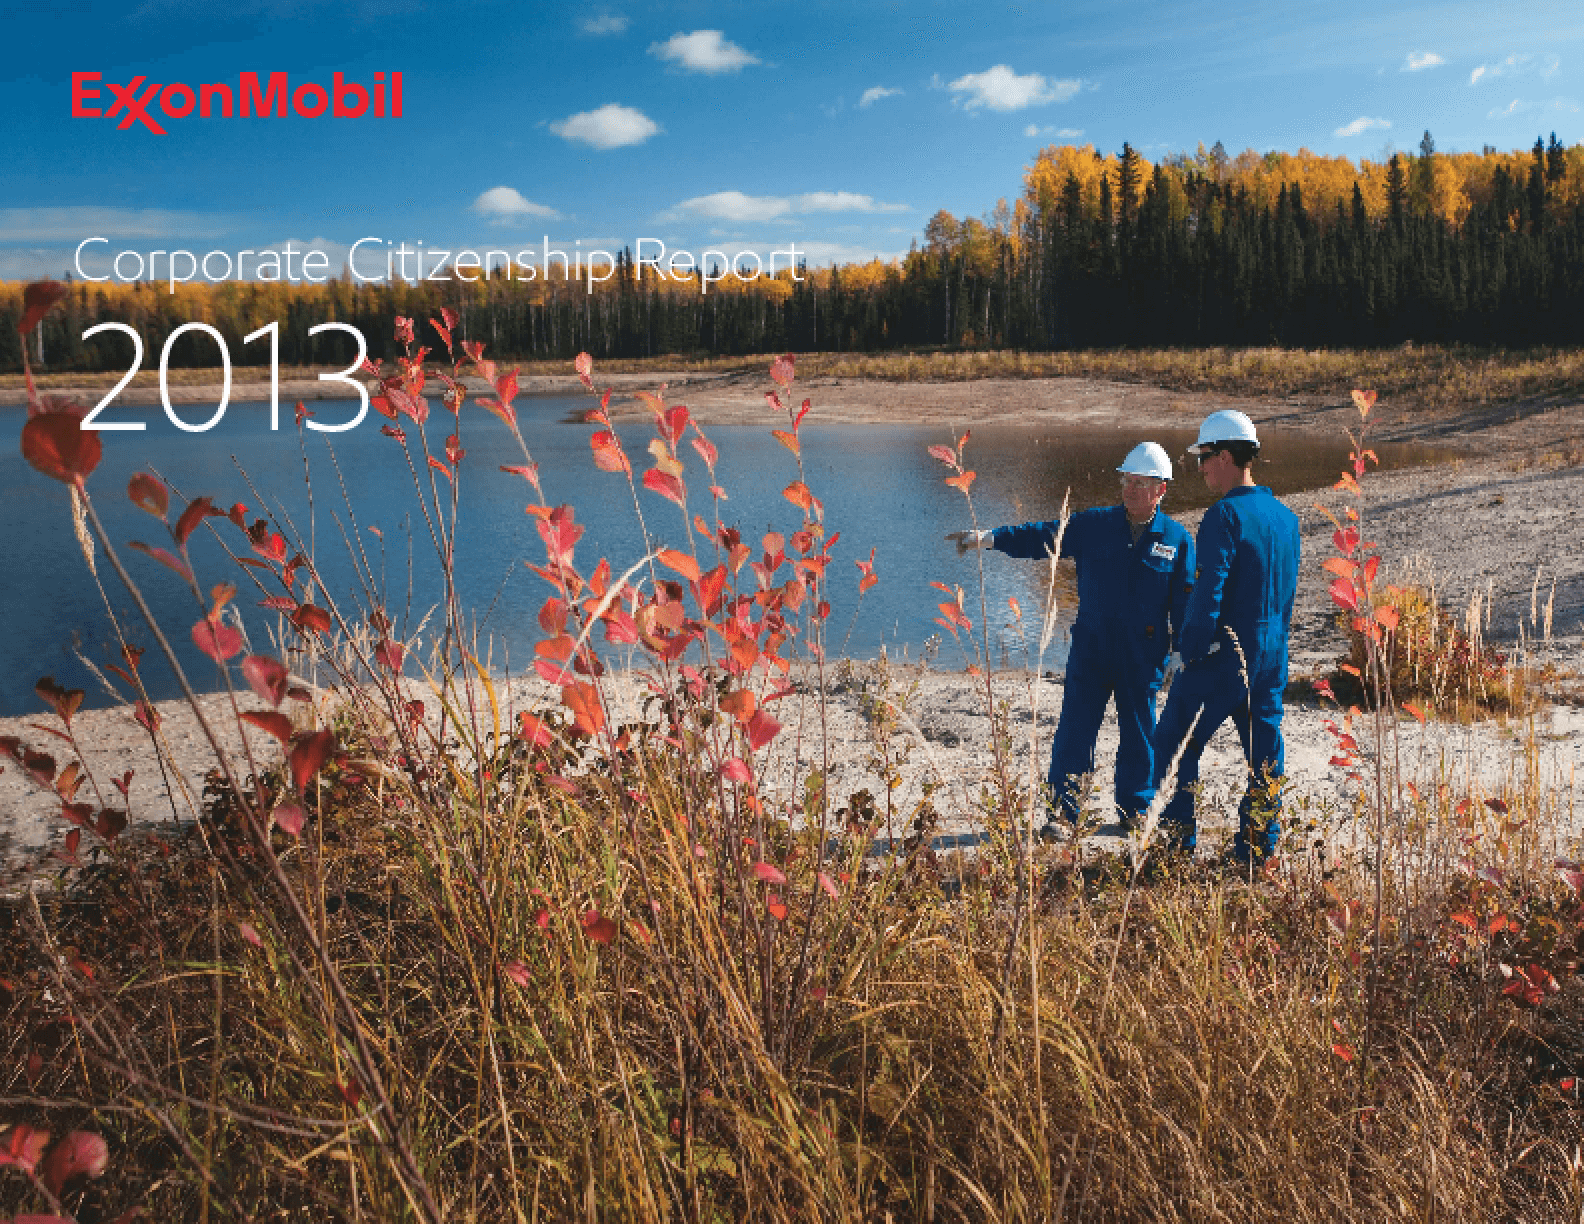 ExxonMobil Corporate Citizenship Report 2013